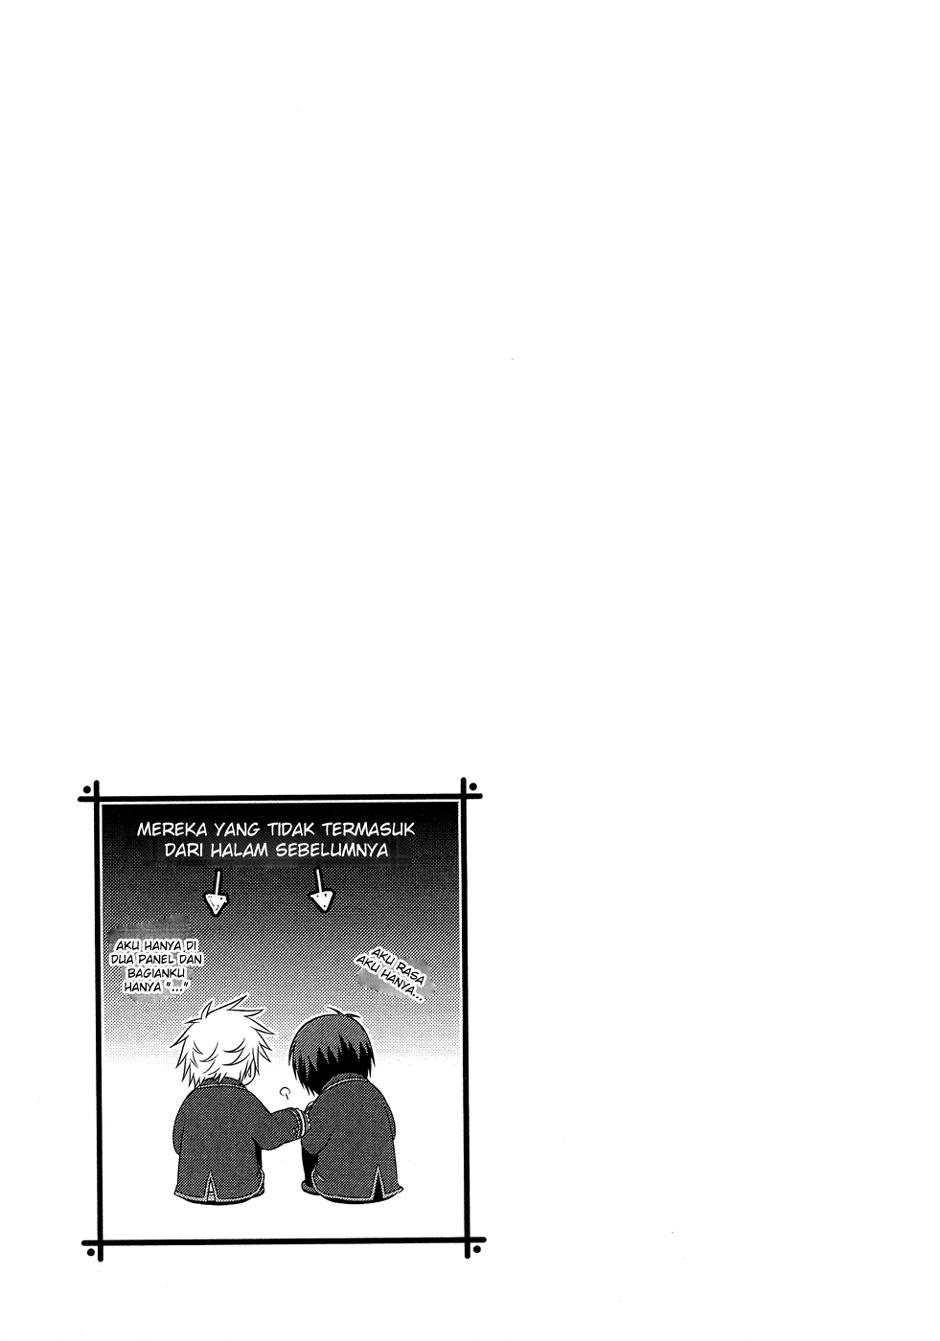 Komik iris zero 011 12 Indonesia iris zero 011 Terbaru 32|Baca Manga Komik Indonesia|